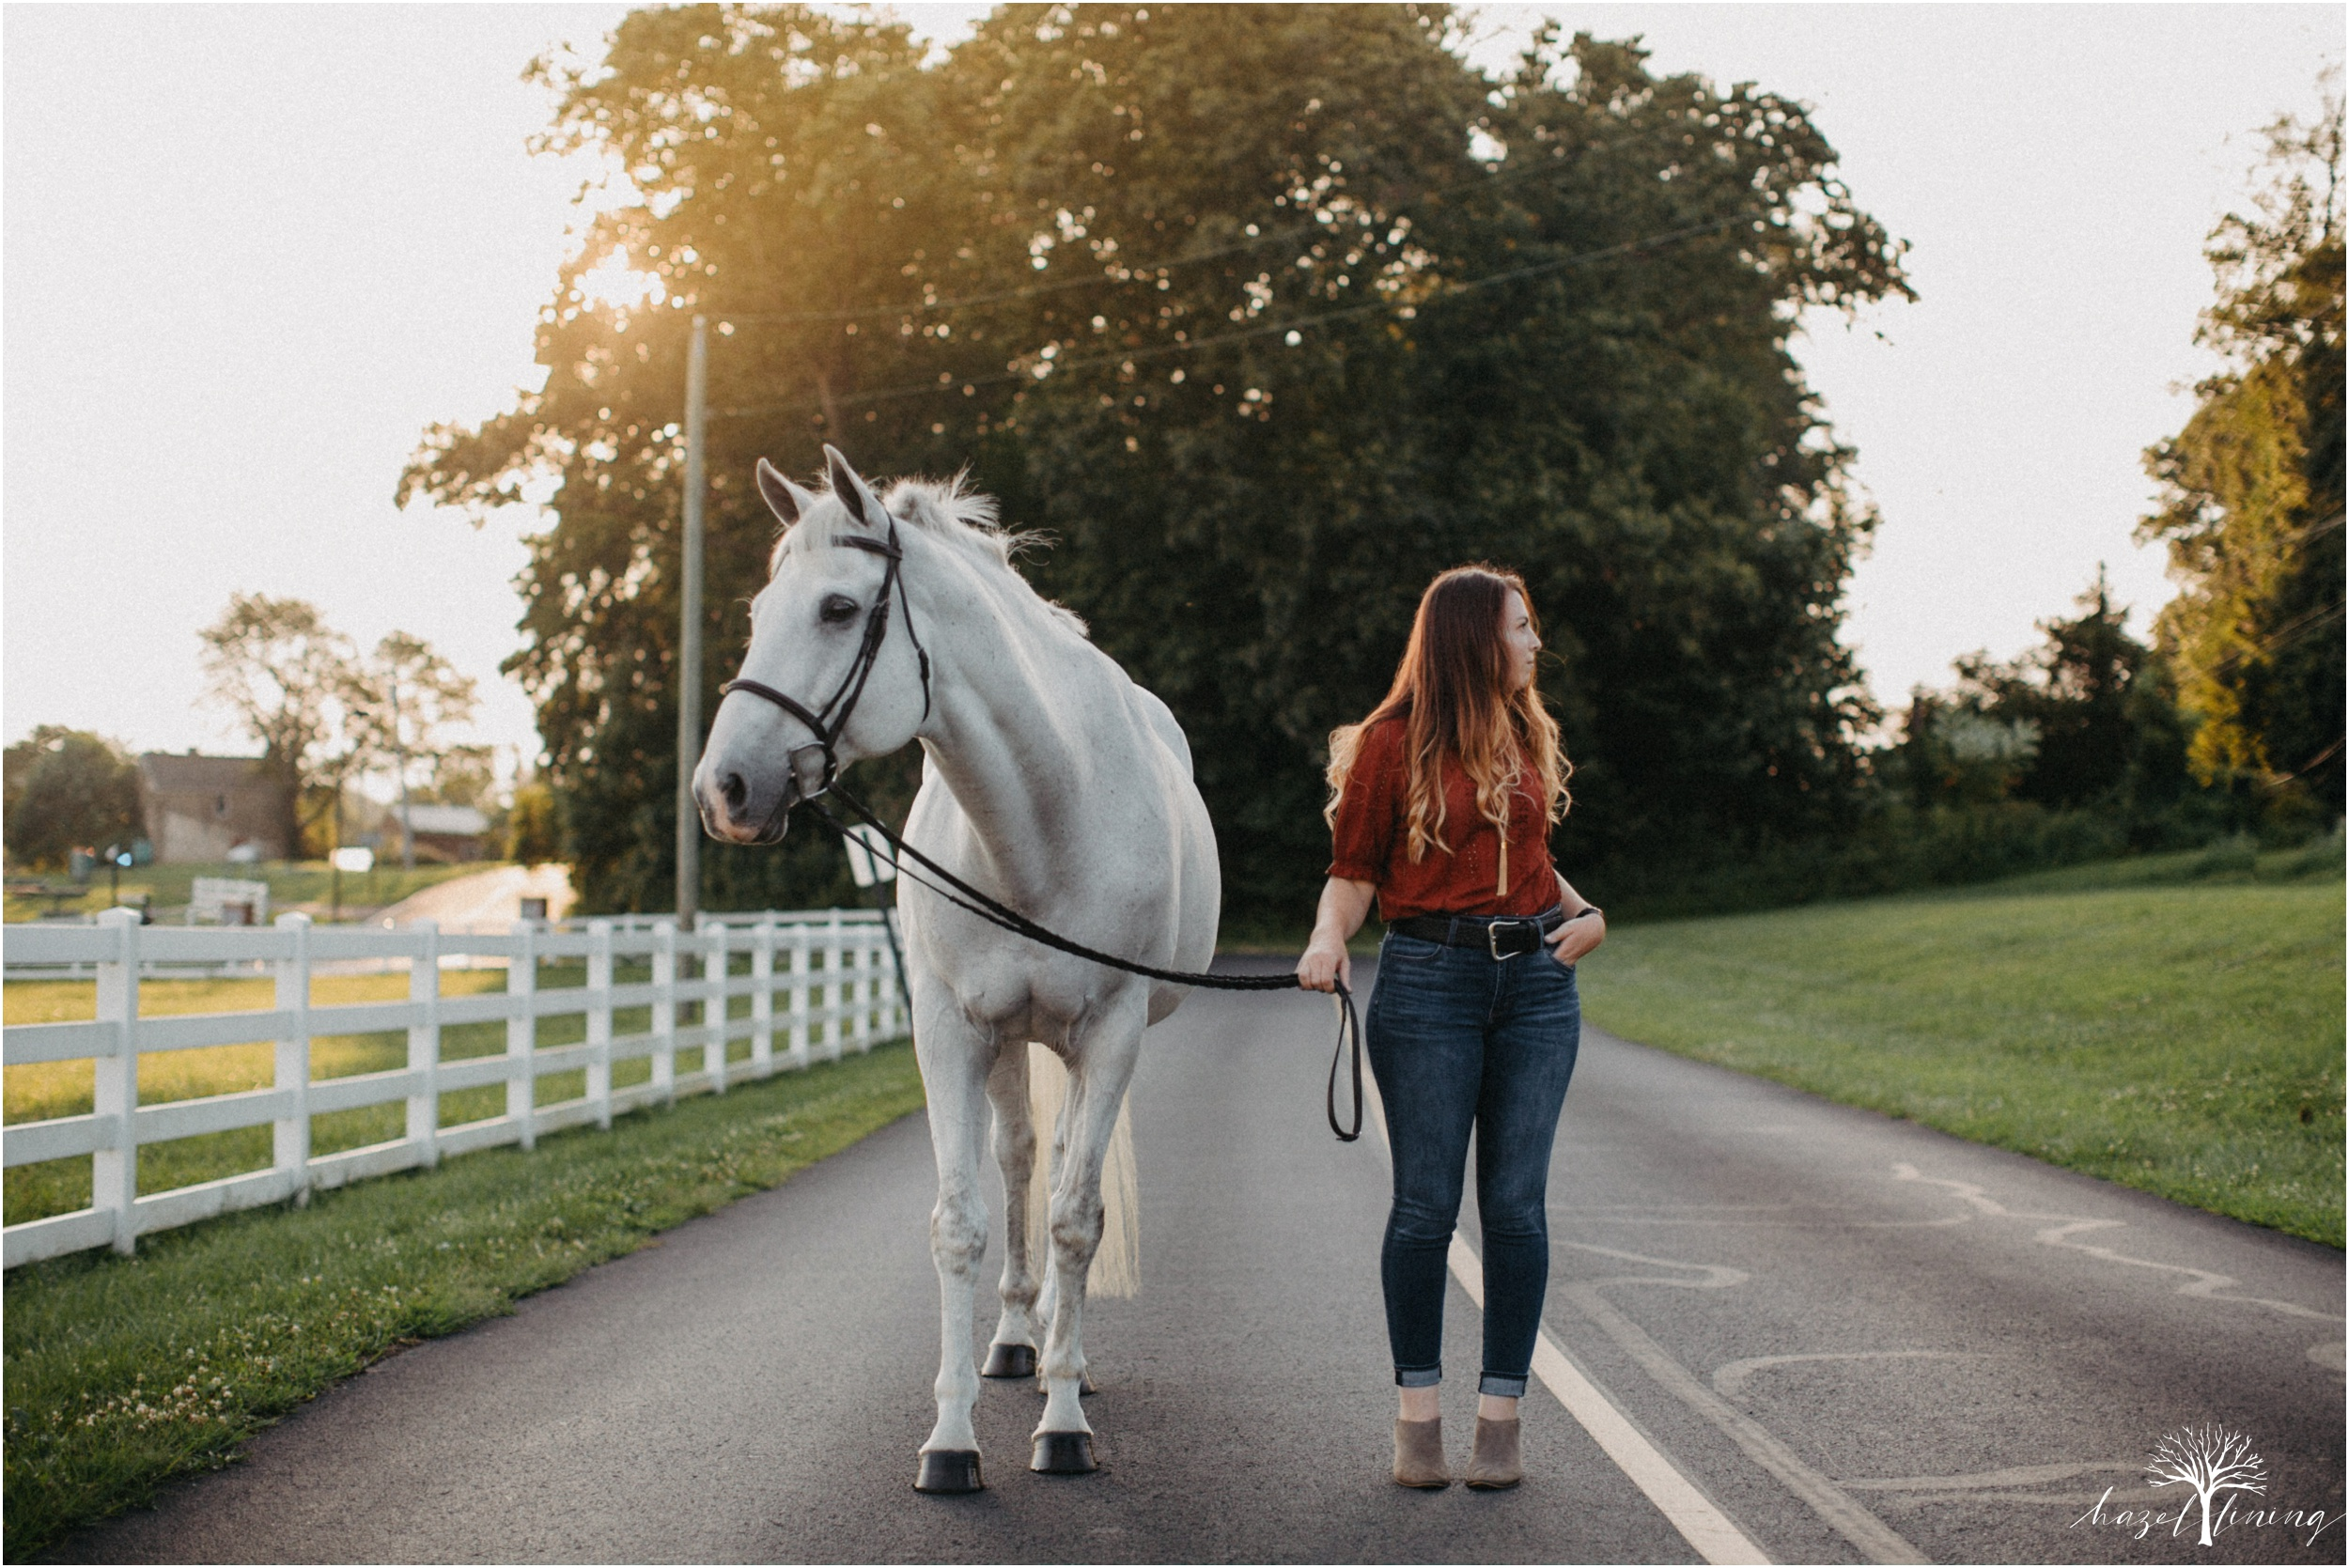 taylor-adams-and-horse-delaware-valley-university-delval-summer-equestrian-portrait-session-hazel-lining-photography-destination-elopement-wedding-engagement-photography_0019.jpg